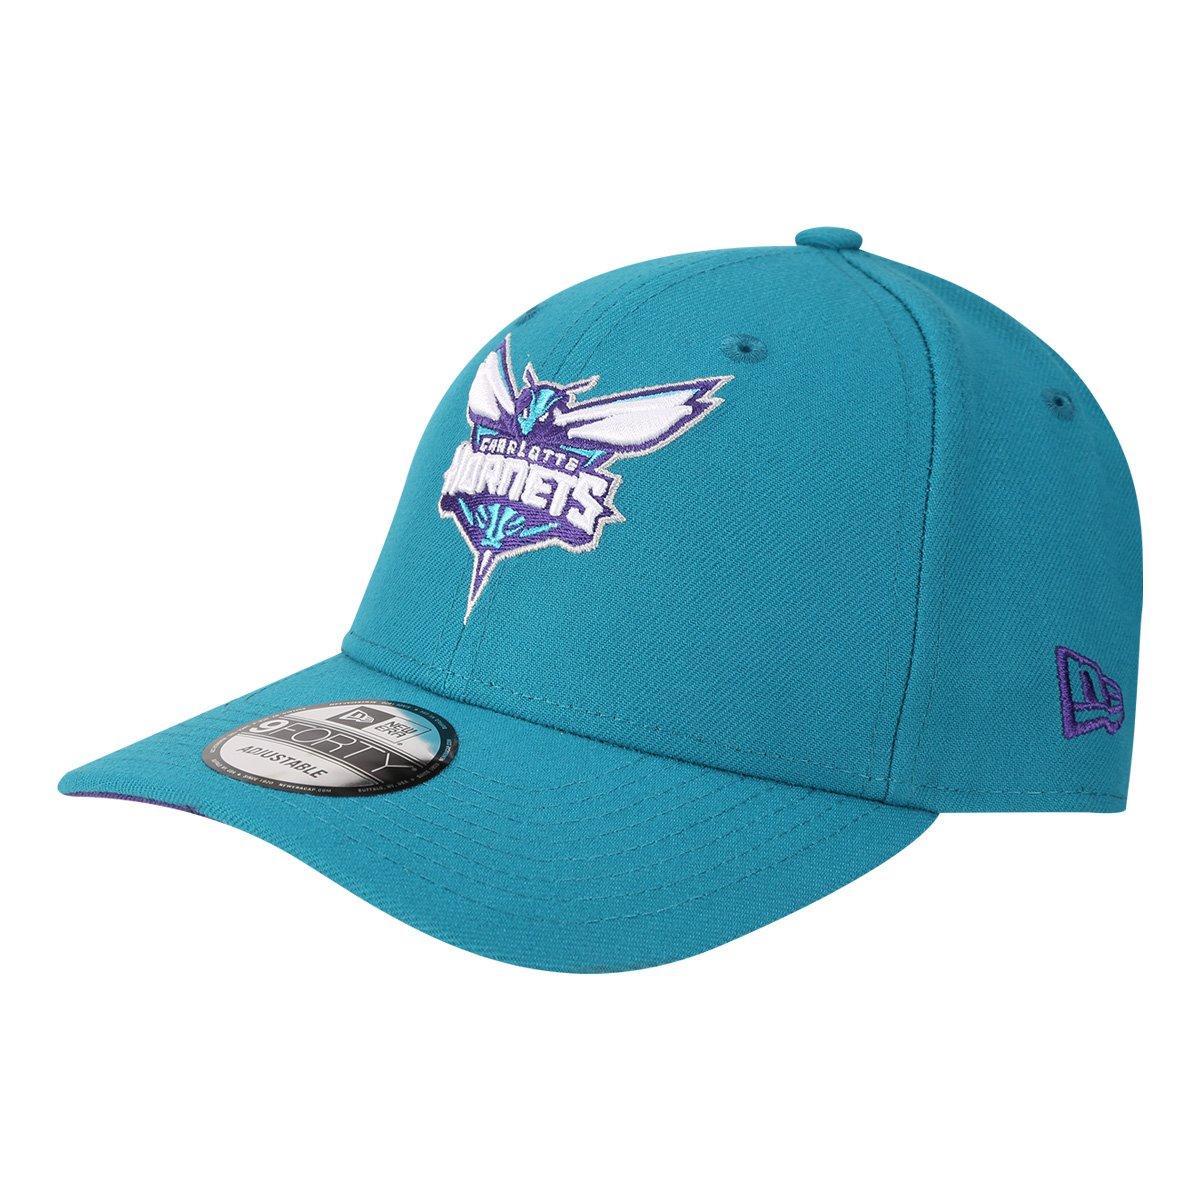 43282979a Boné New Era NBA Charlotte Hornets Aba Curva Primary - Compre Agora ...